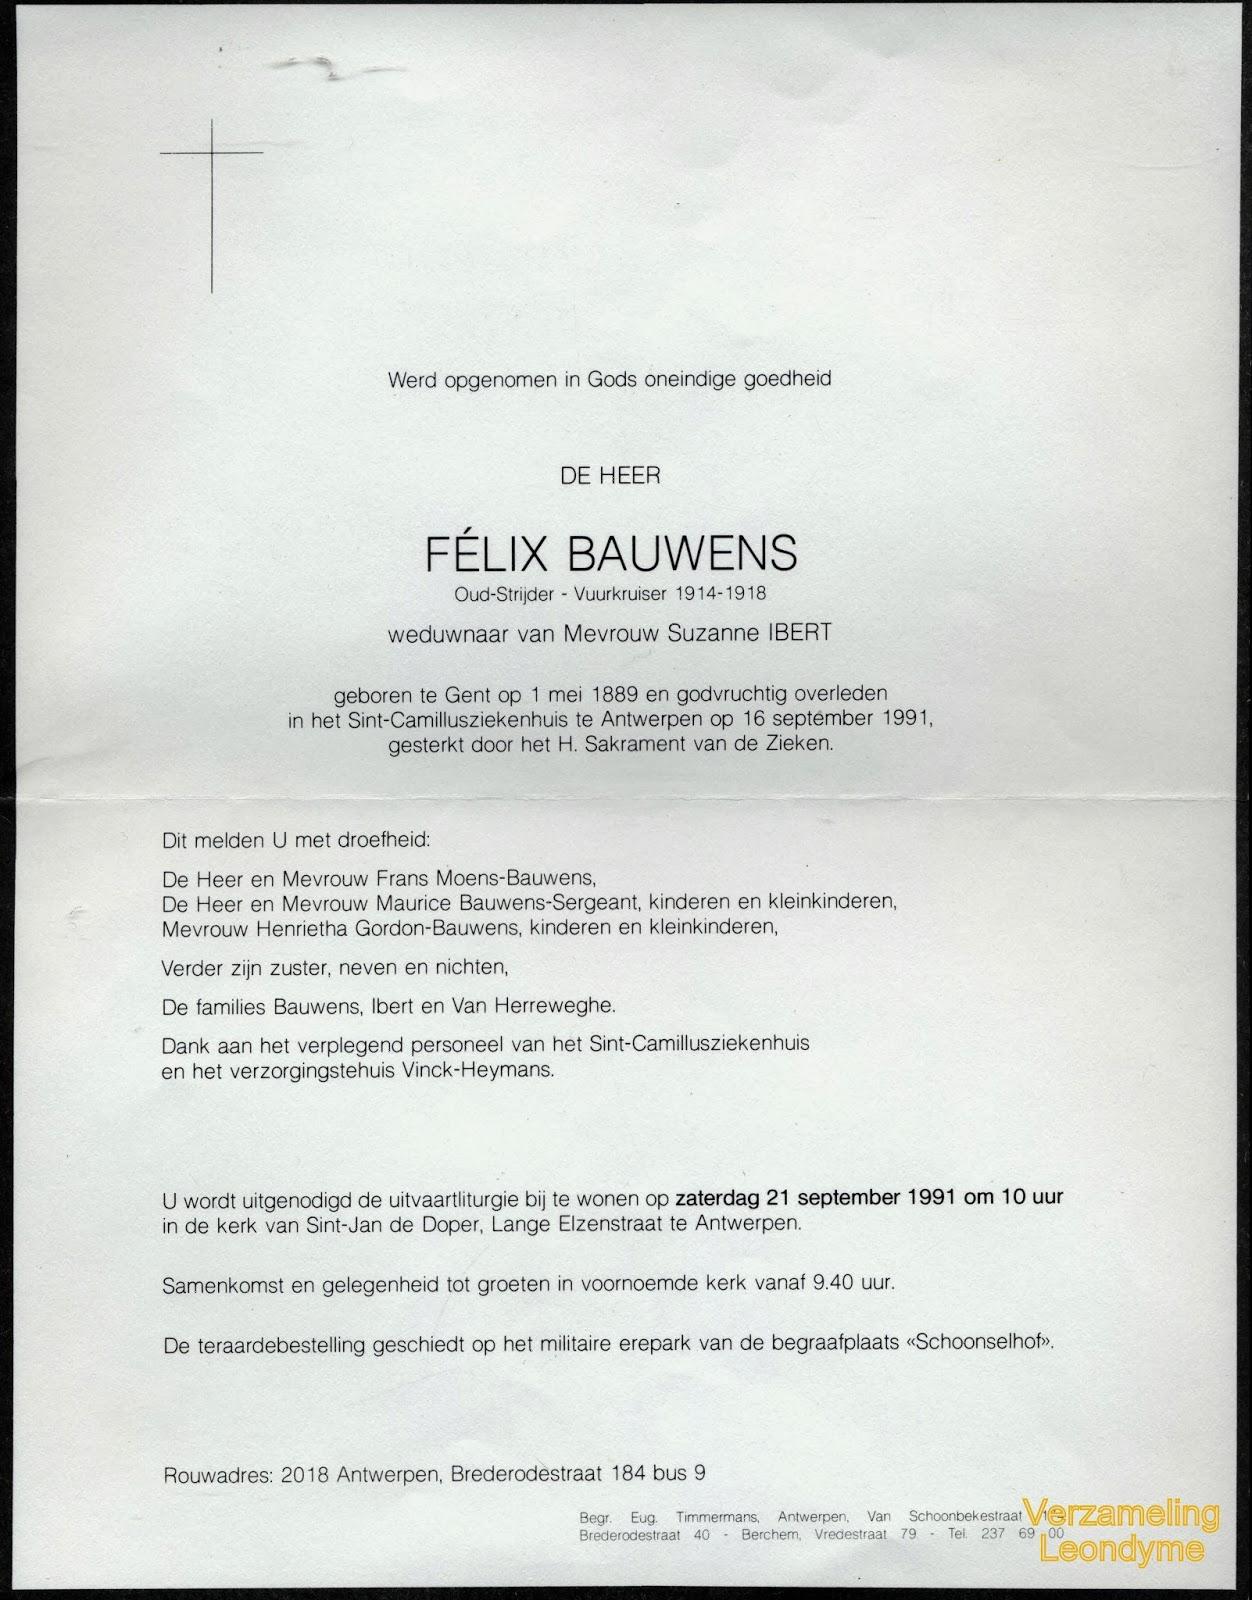 Rouwbrief van oud-strijder-vuurkruiser en oorlogsinvalide Félix Bauwens 1889-1991.Verzameling Leondyme